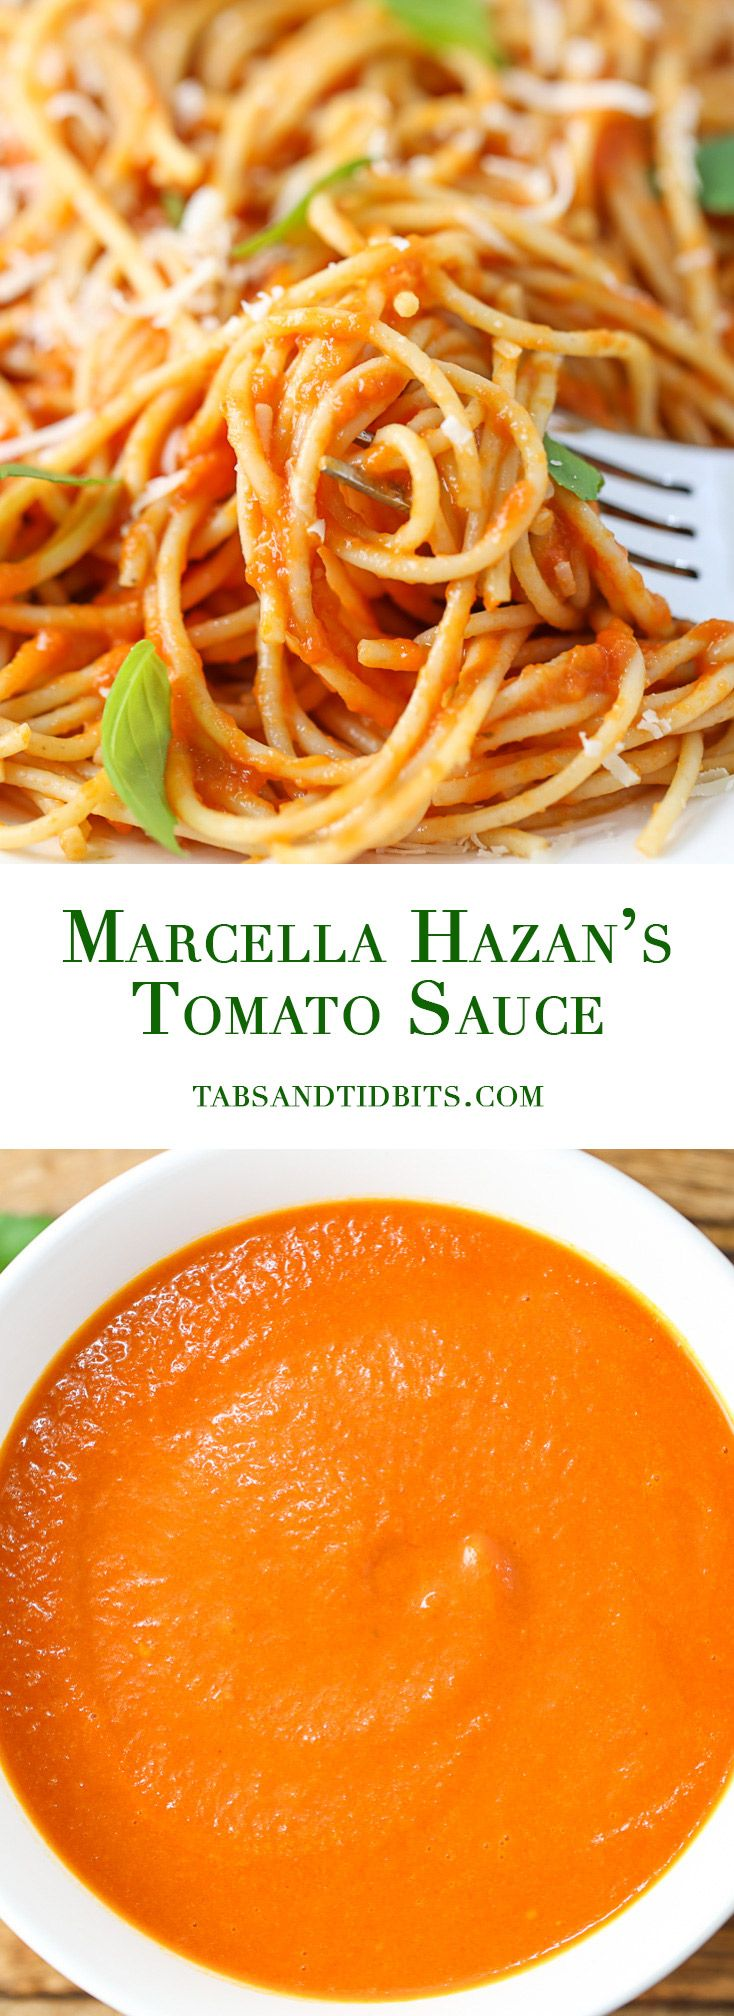 Marcella Hazan's Tomato Sauce - A simple and versatile three ingredient tomato sauce that is velvety delicious!